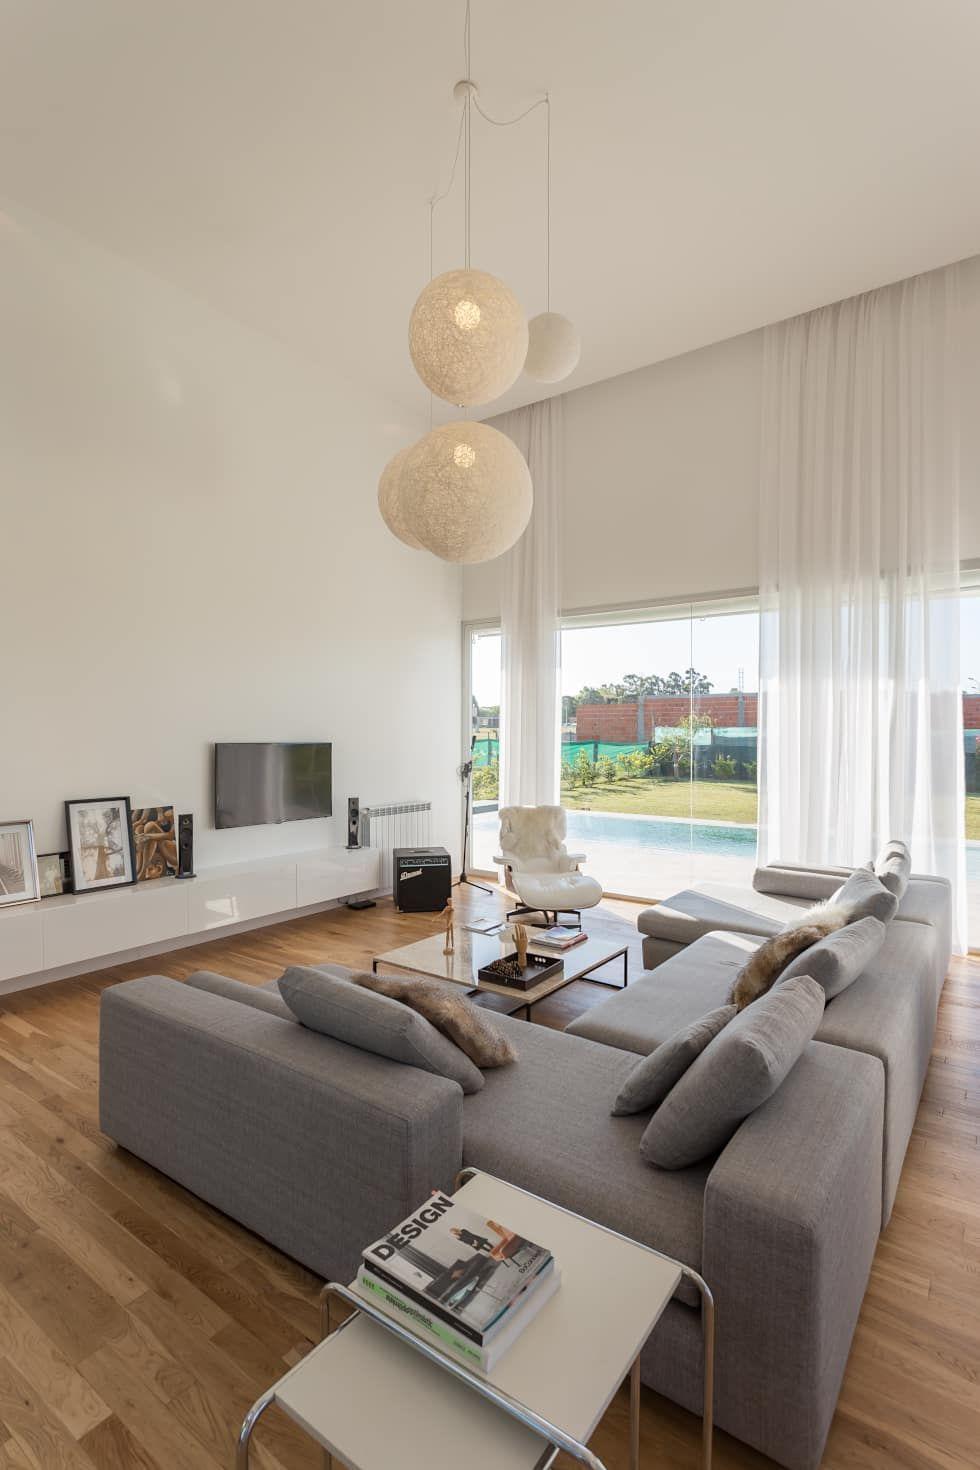 Living livings de estilo por vismaracorsi arquitectos en for Muebles de living comedor modernos